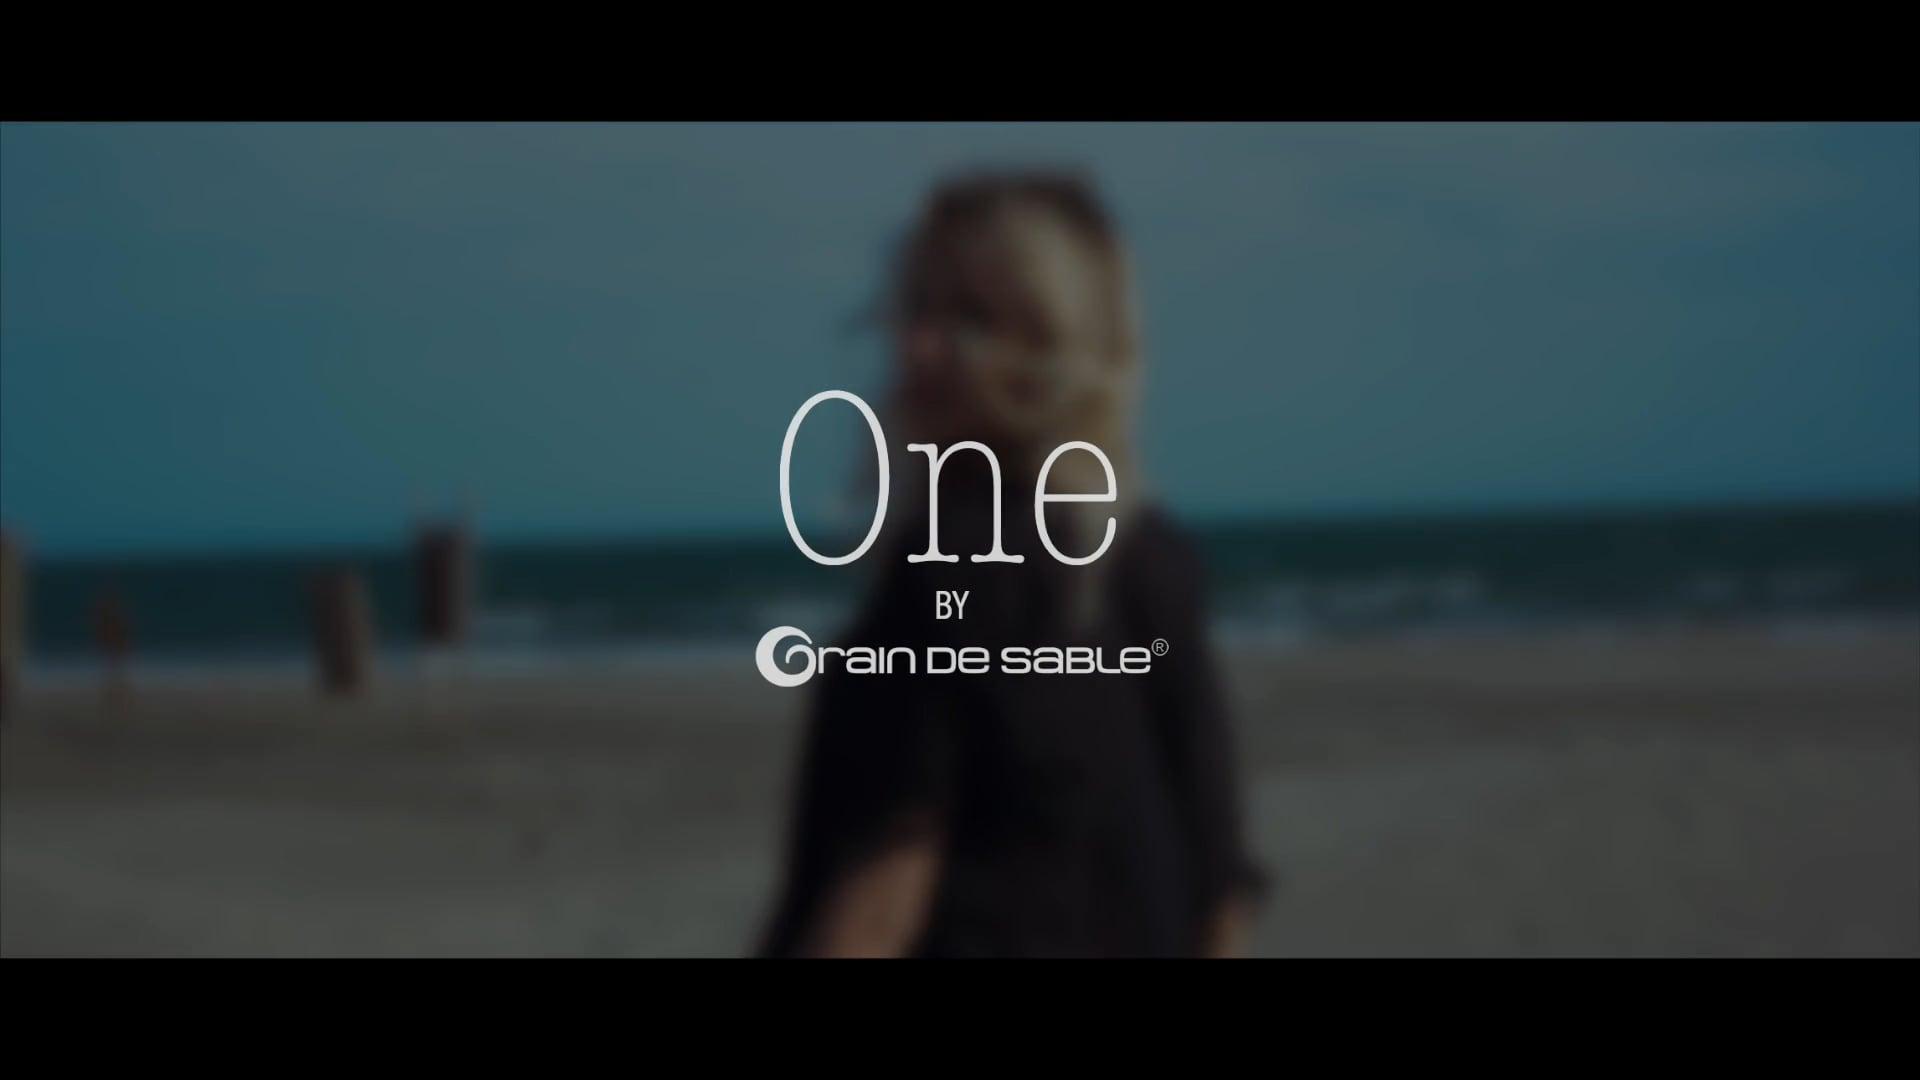 ONE by Grain de Sable 2020